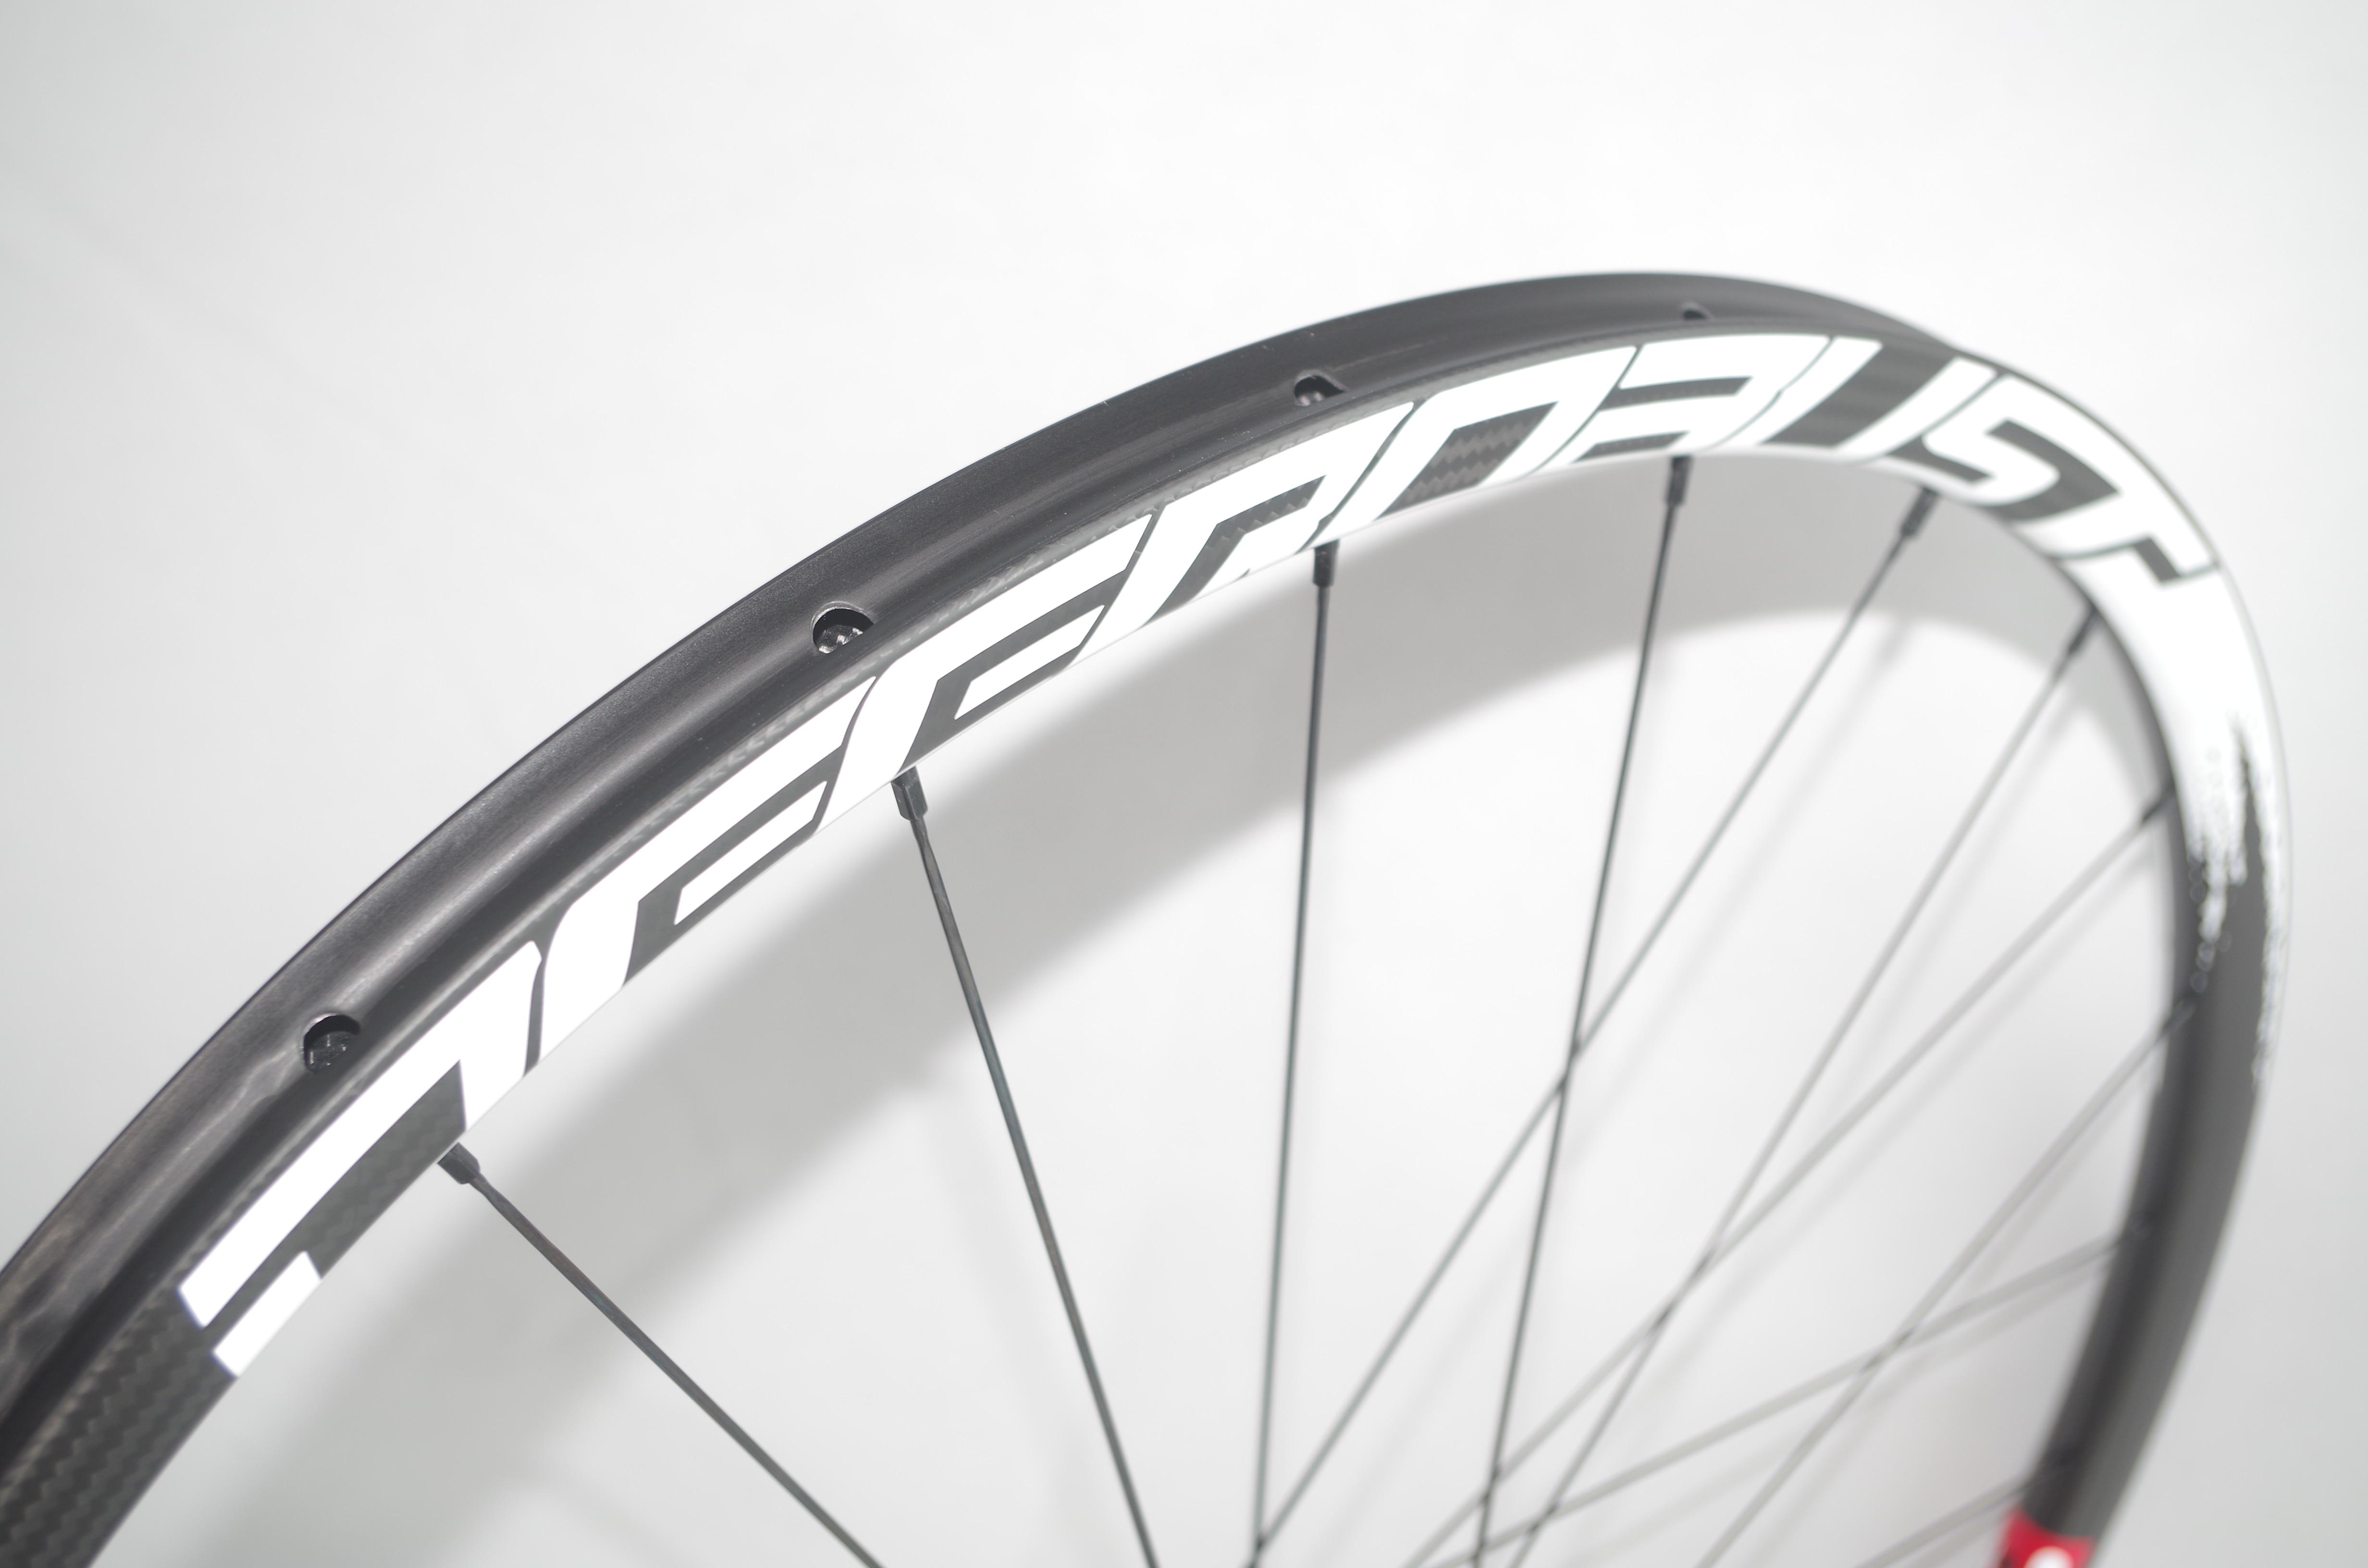 Maxxis Refuse Road Bike Tires 700x 23C 1pcs,Blue